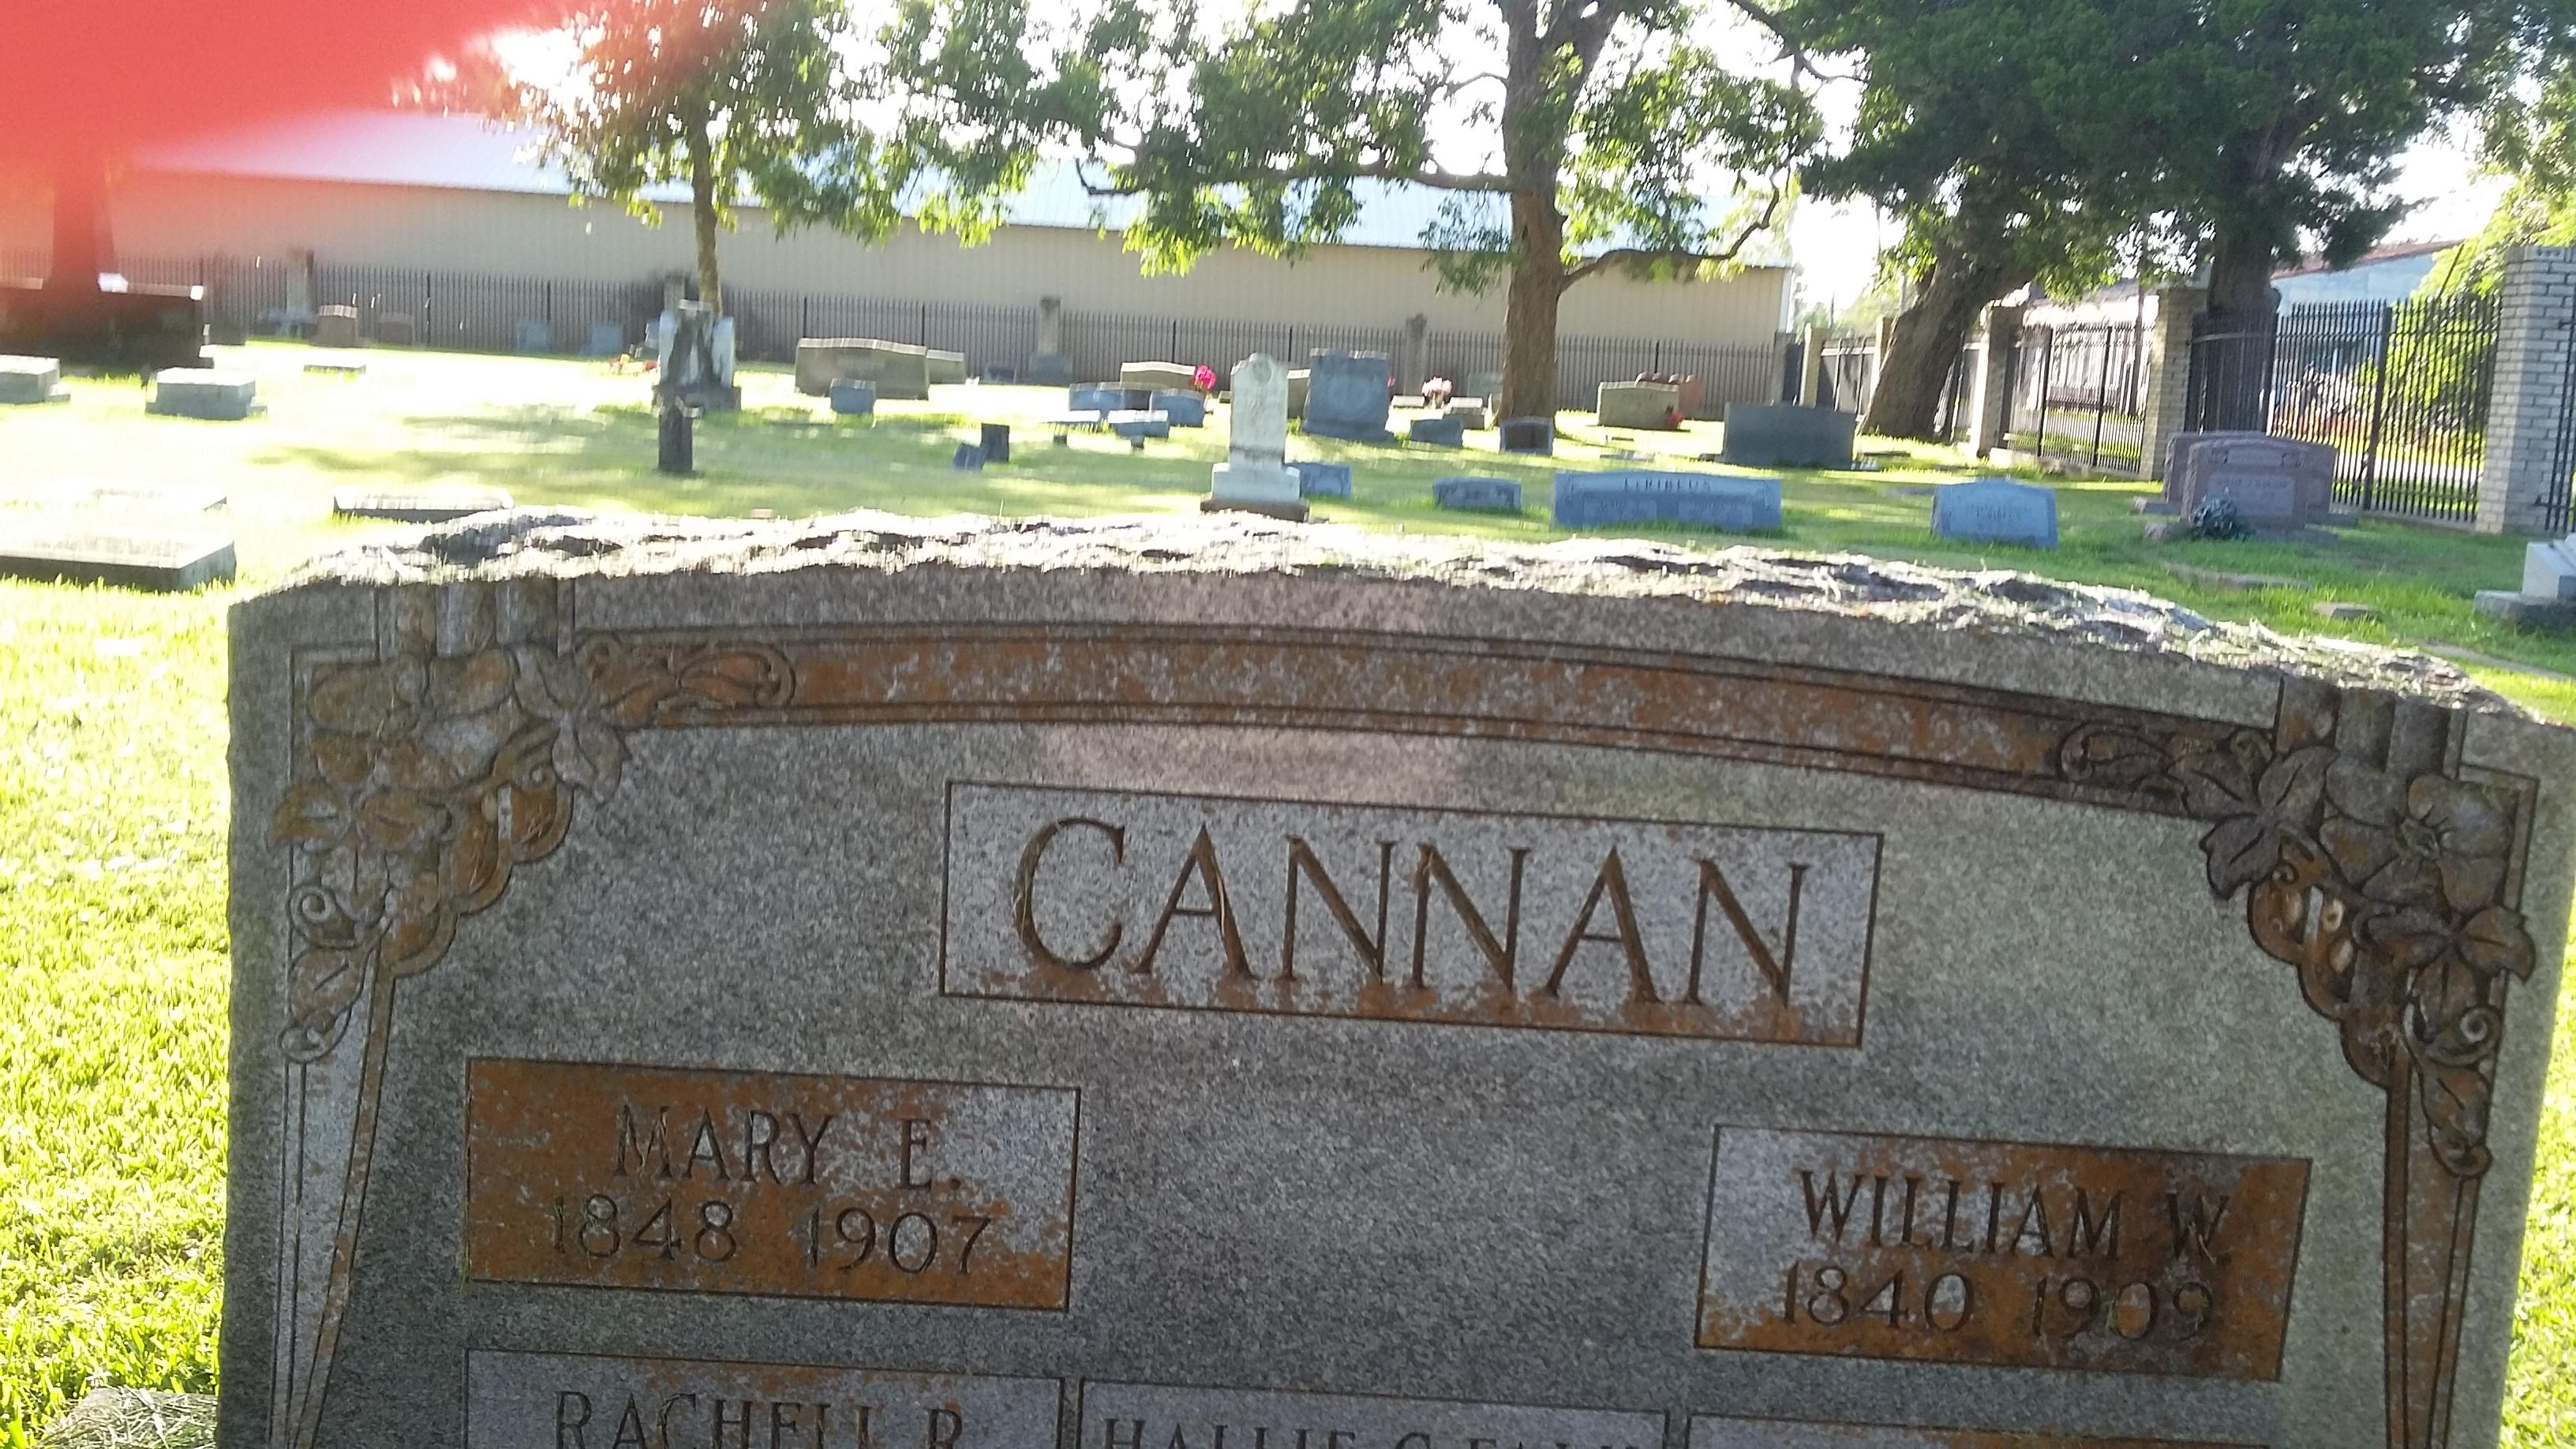 Wherry M Cannon